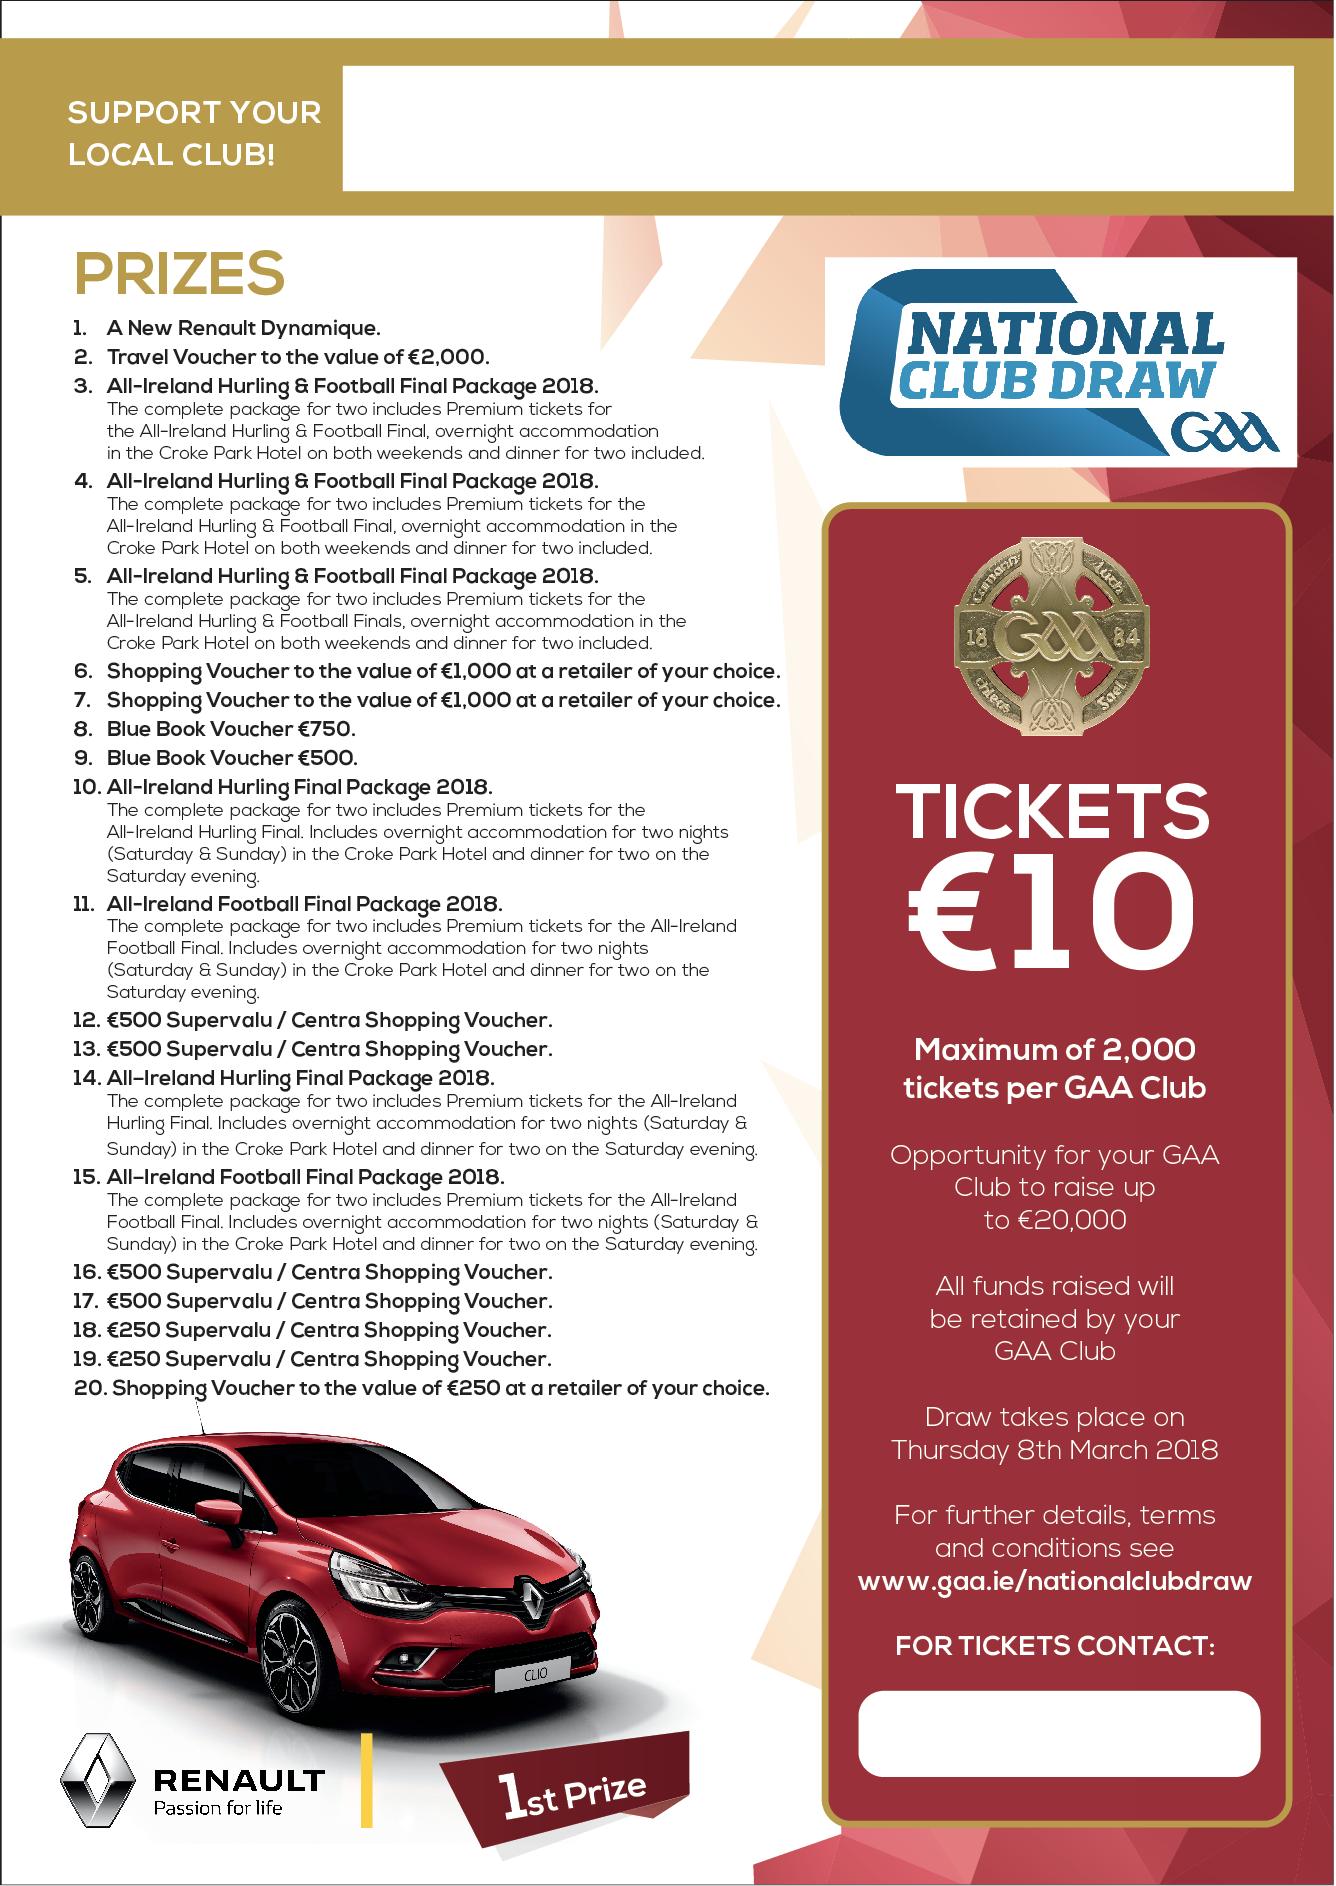 GAA National Club Draw | Club Information | Naomh Mearnóg